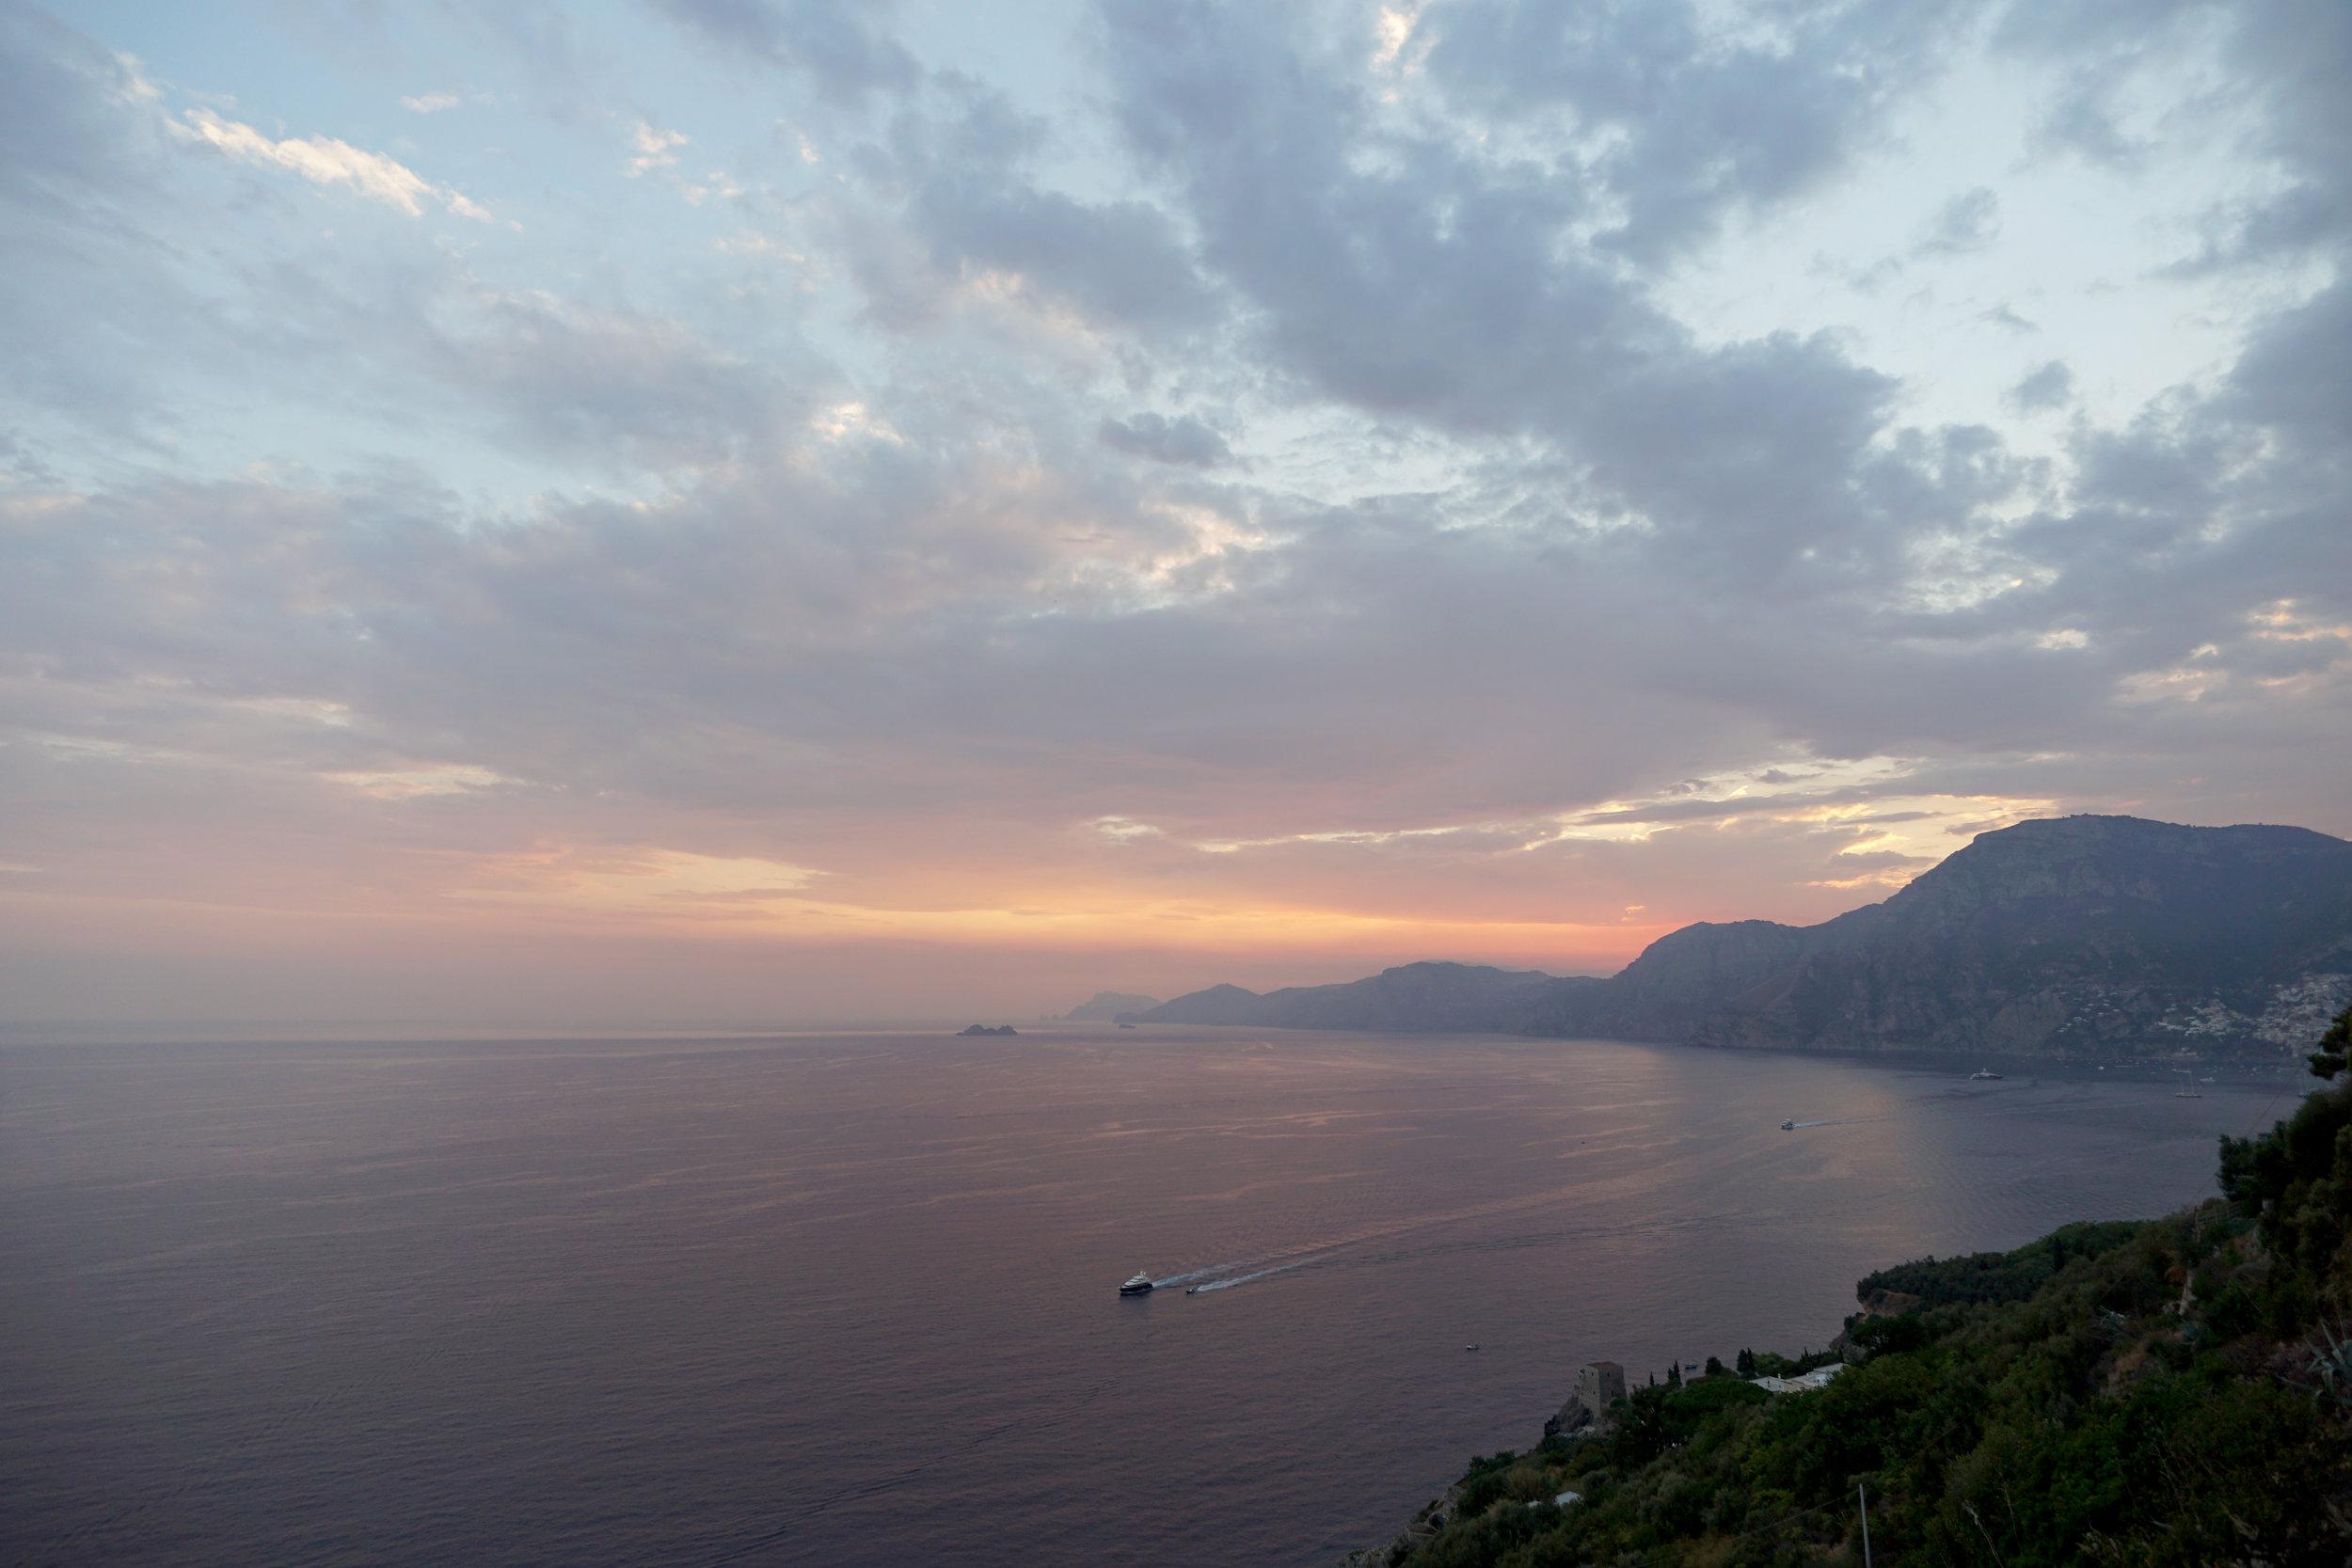 Sunset at Praiano